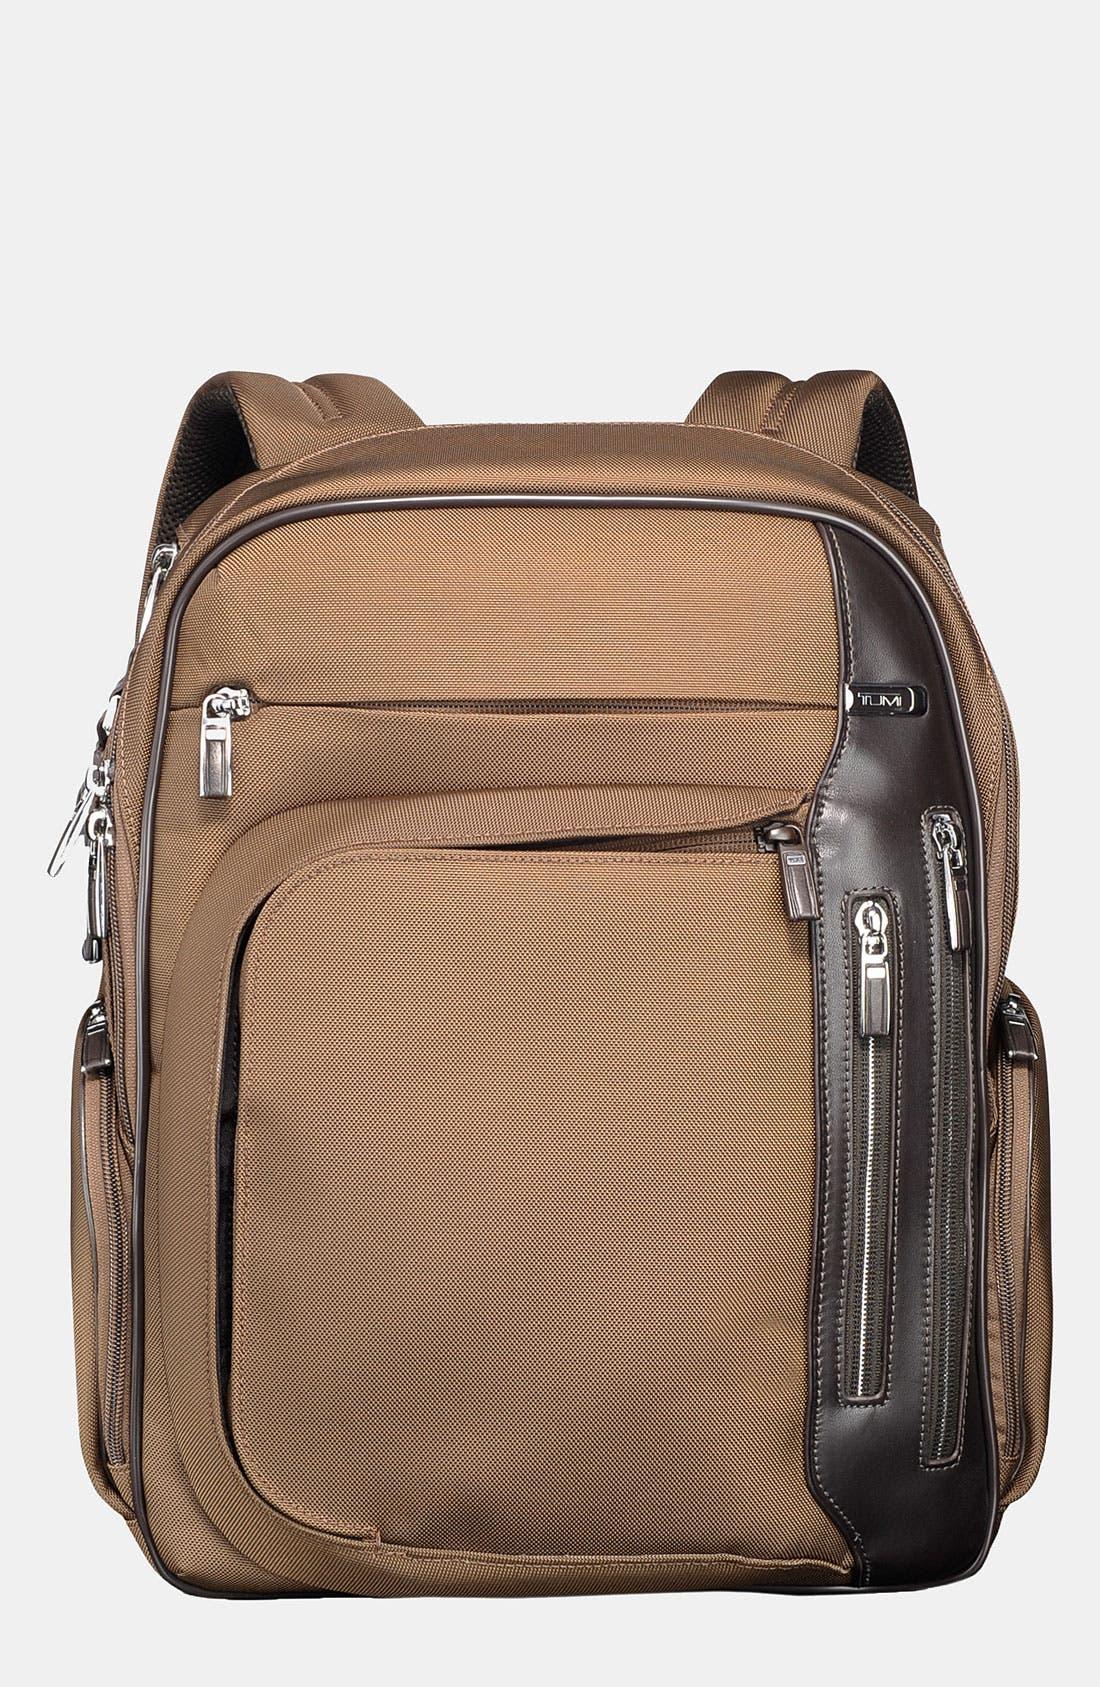 Main Image - Tumi 'Arrive - Kingsford' Backpack